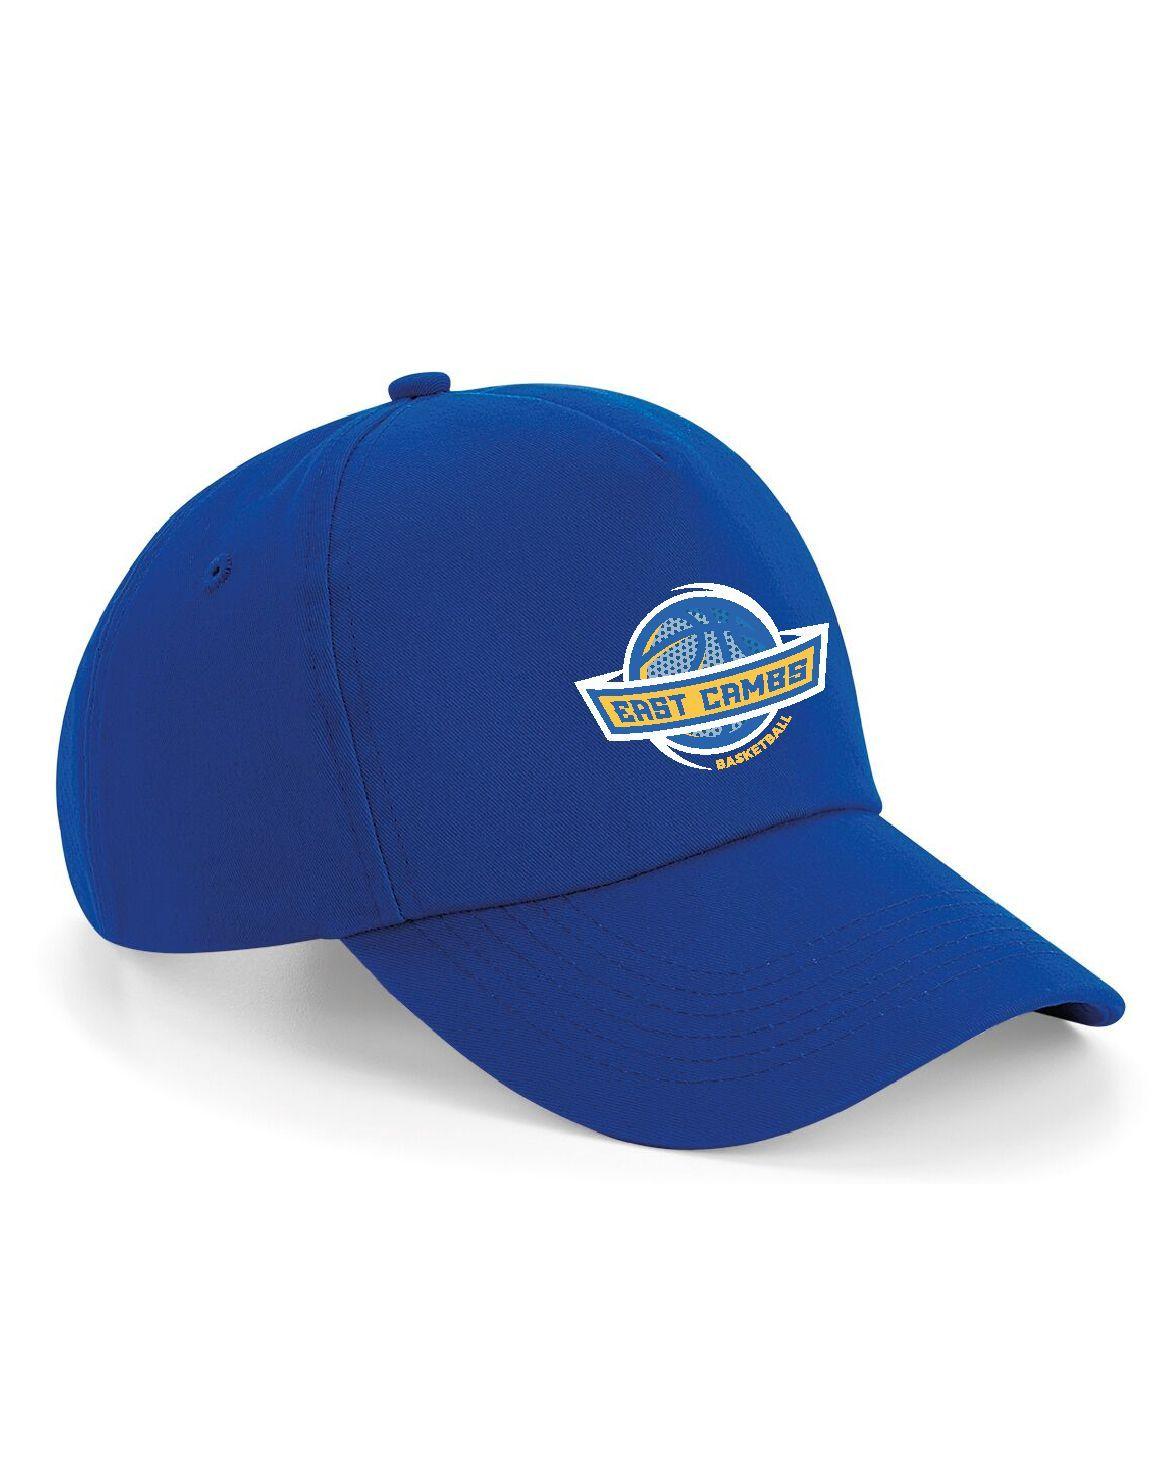 Warriors - Globe Cap (Royal Blue)